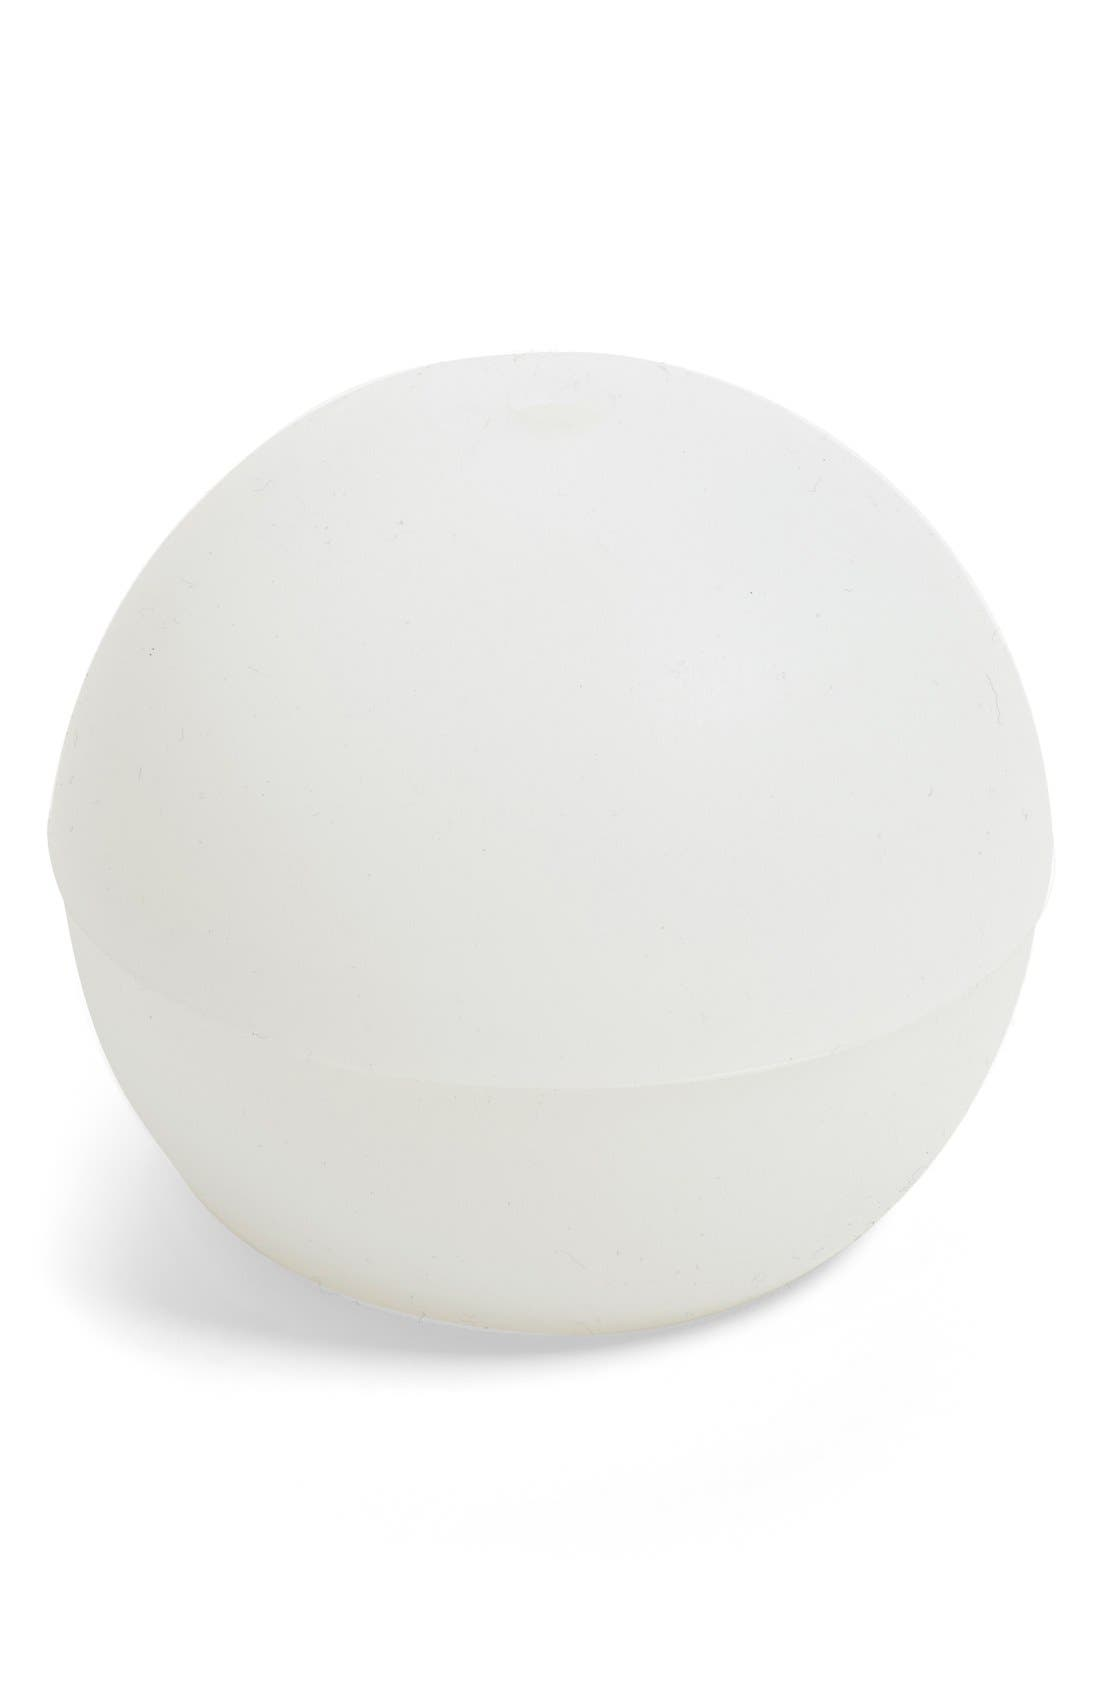 The Original WHISKEY BALL Ice Mold